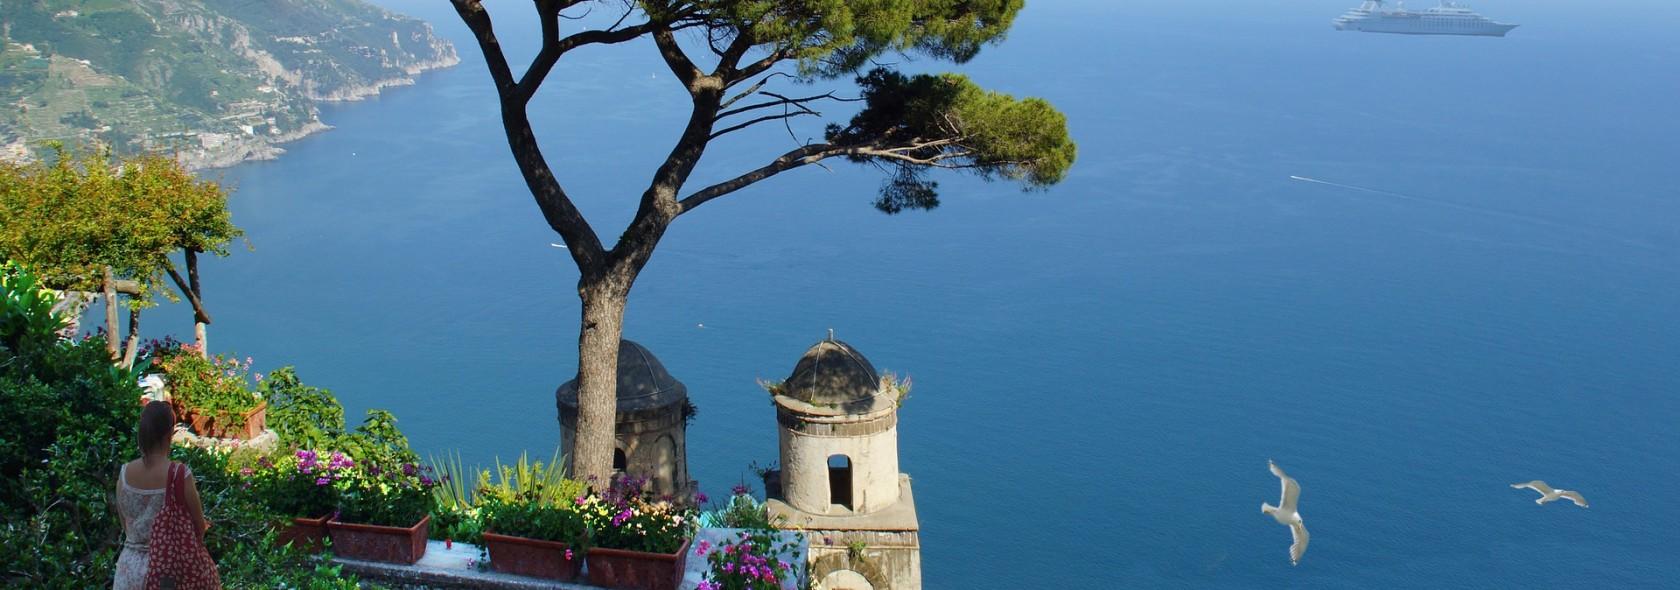 Tour Costiera Amalfitana